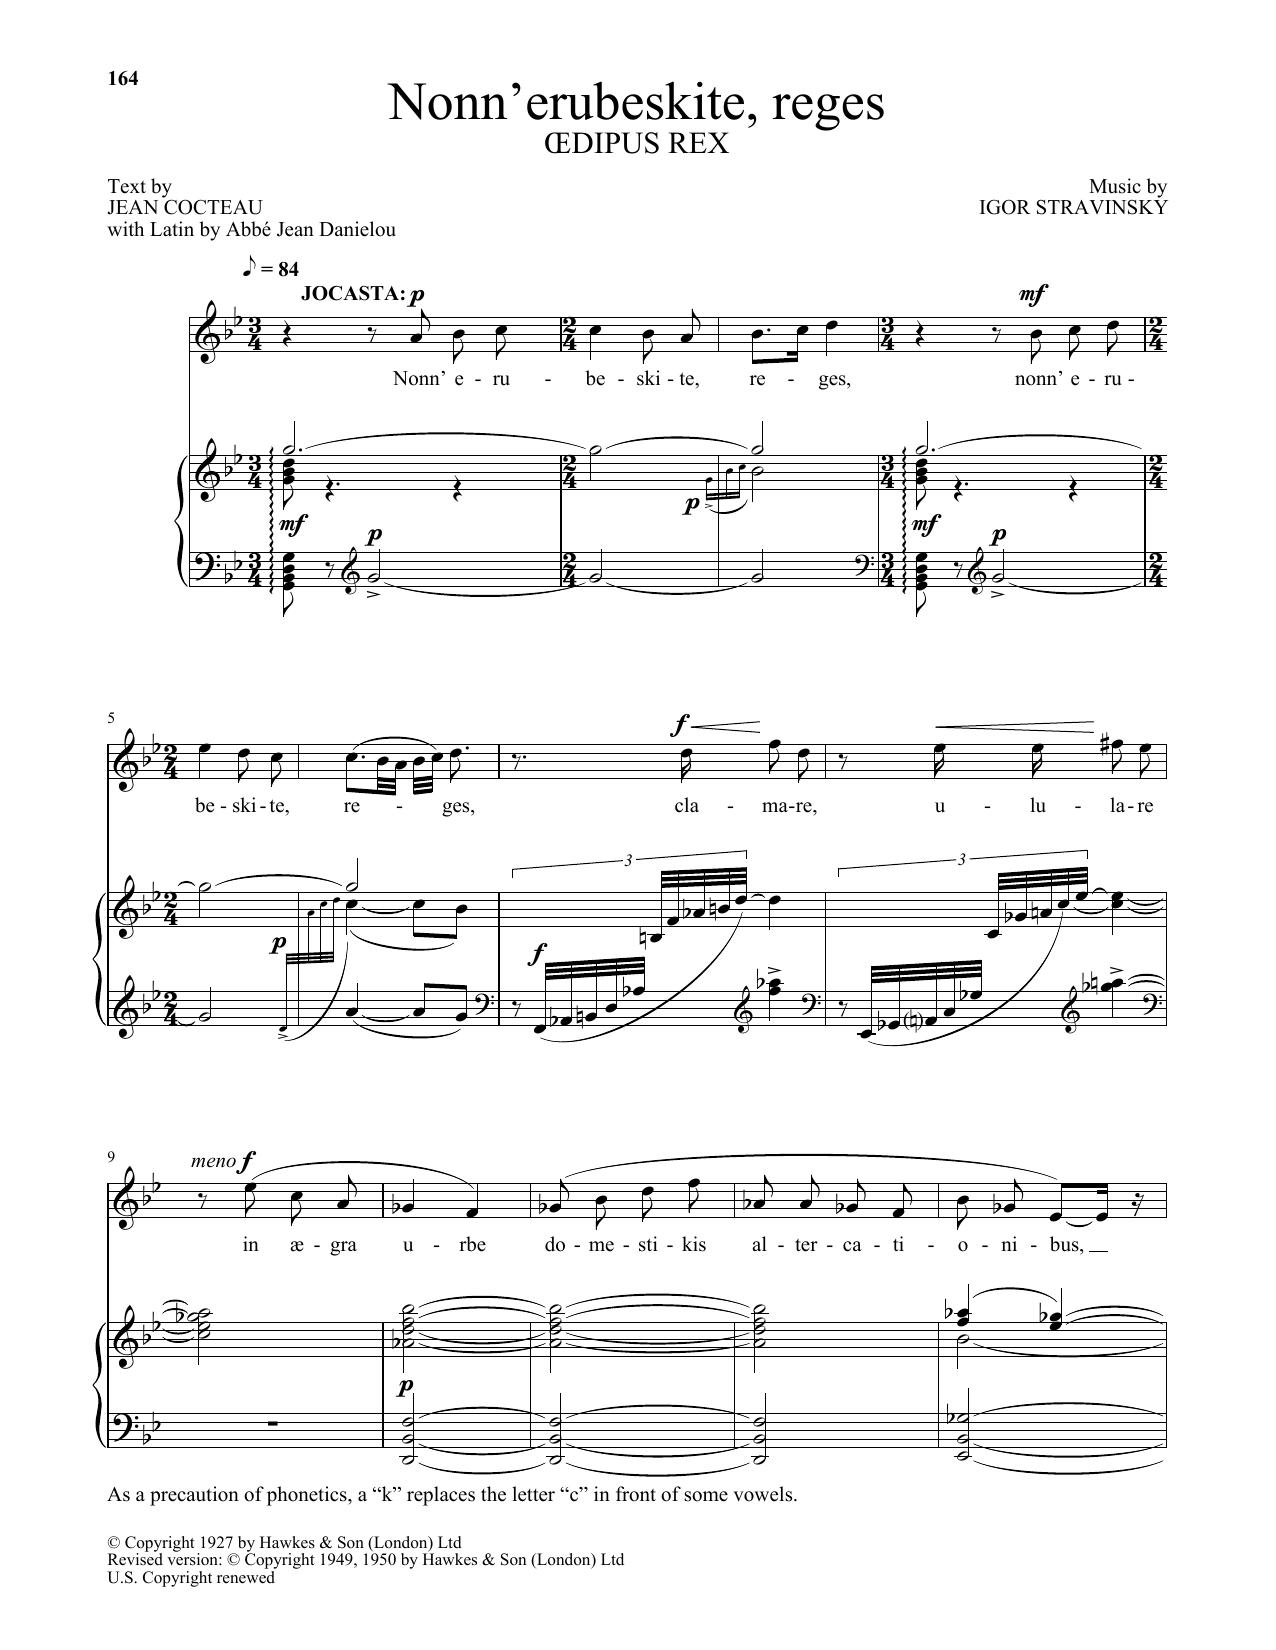 Nonn' erubeskite, reges (from Oedipus Rex) (Piano & Vocal)